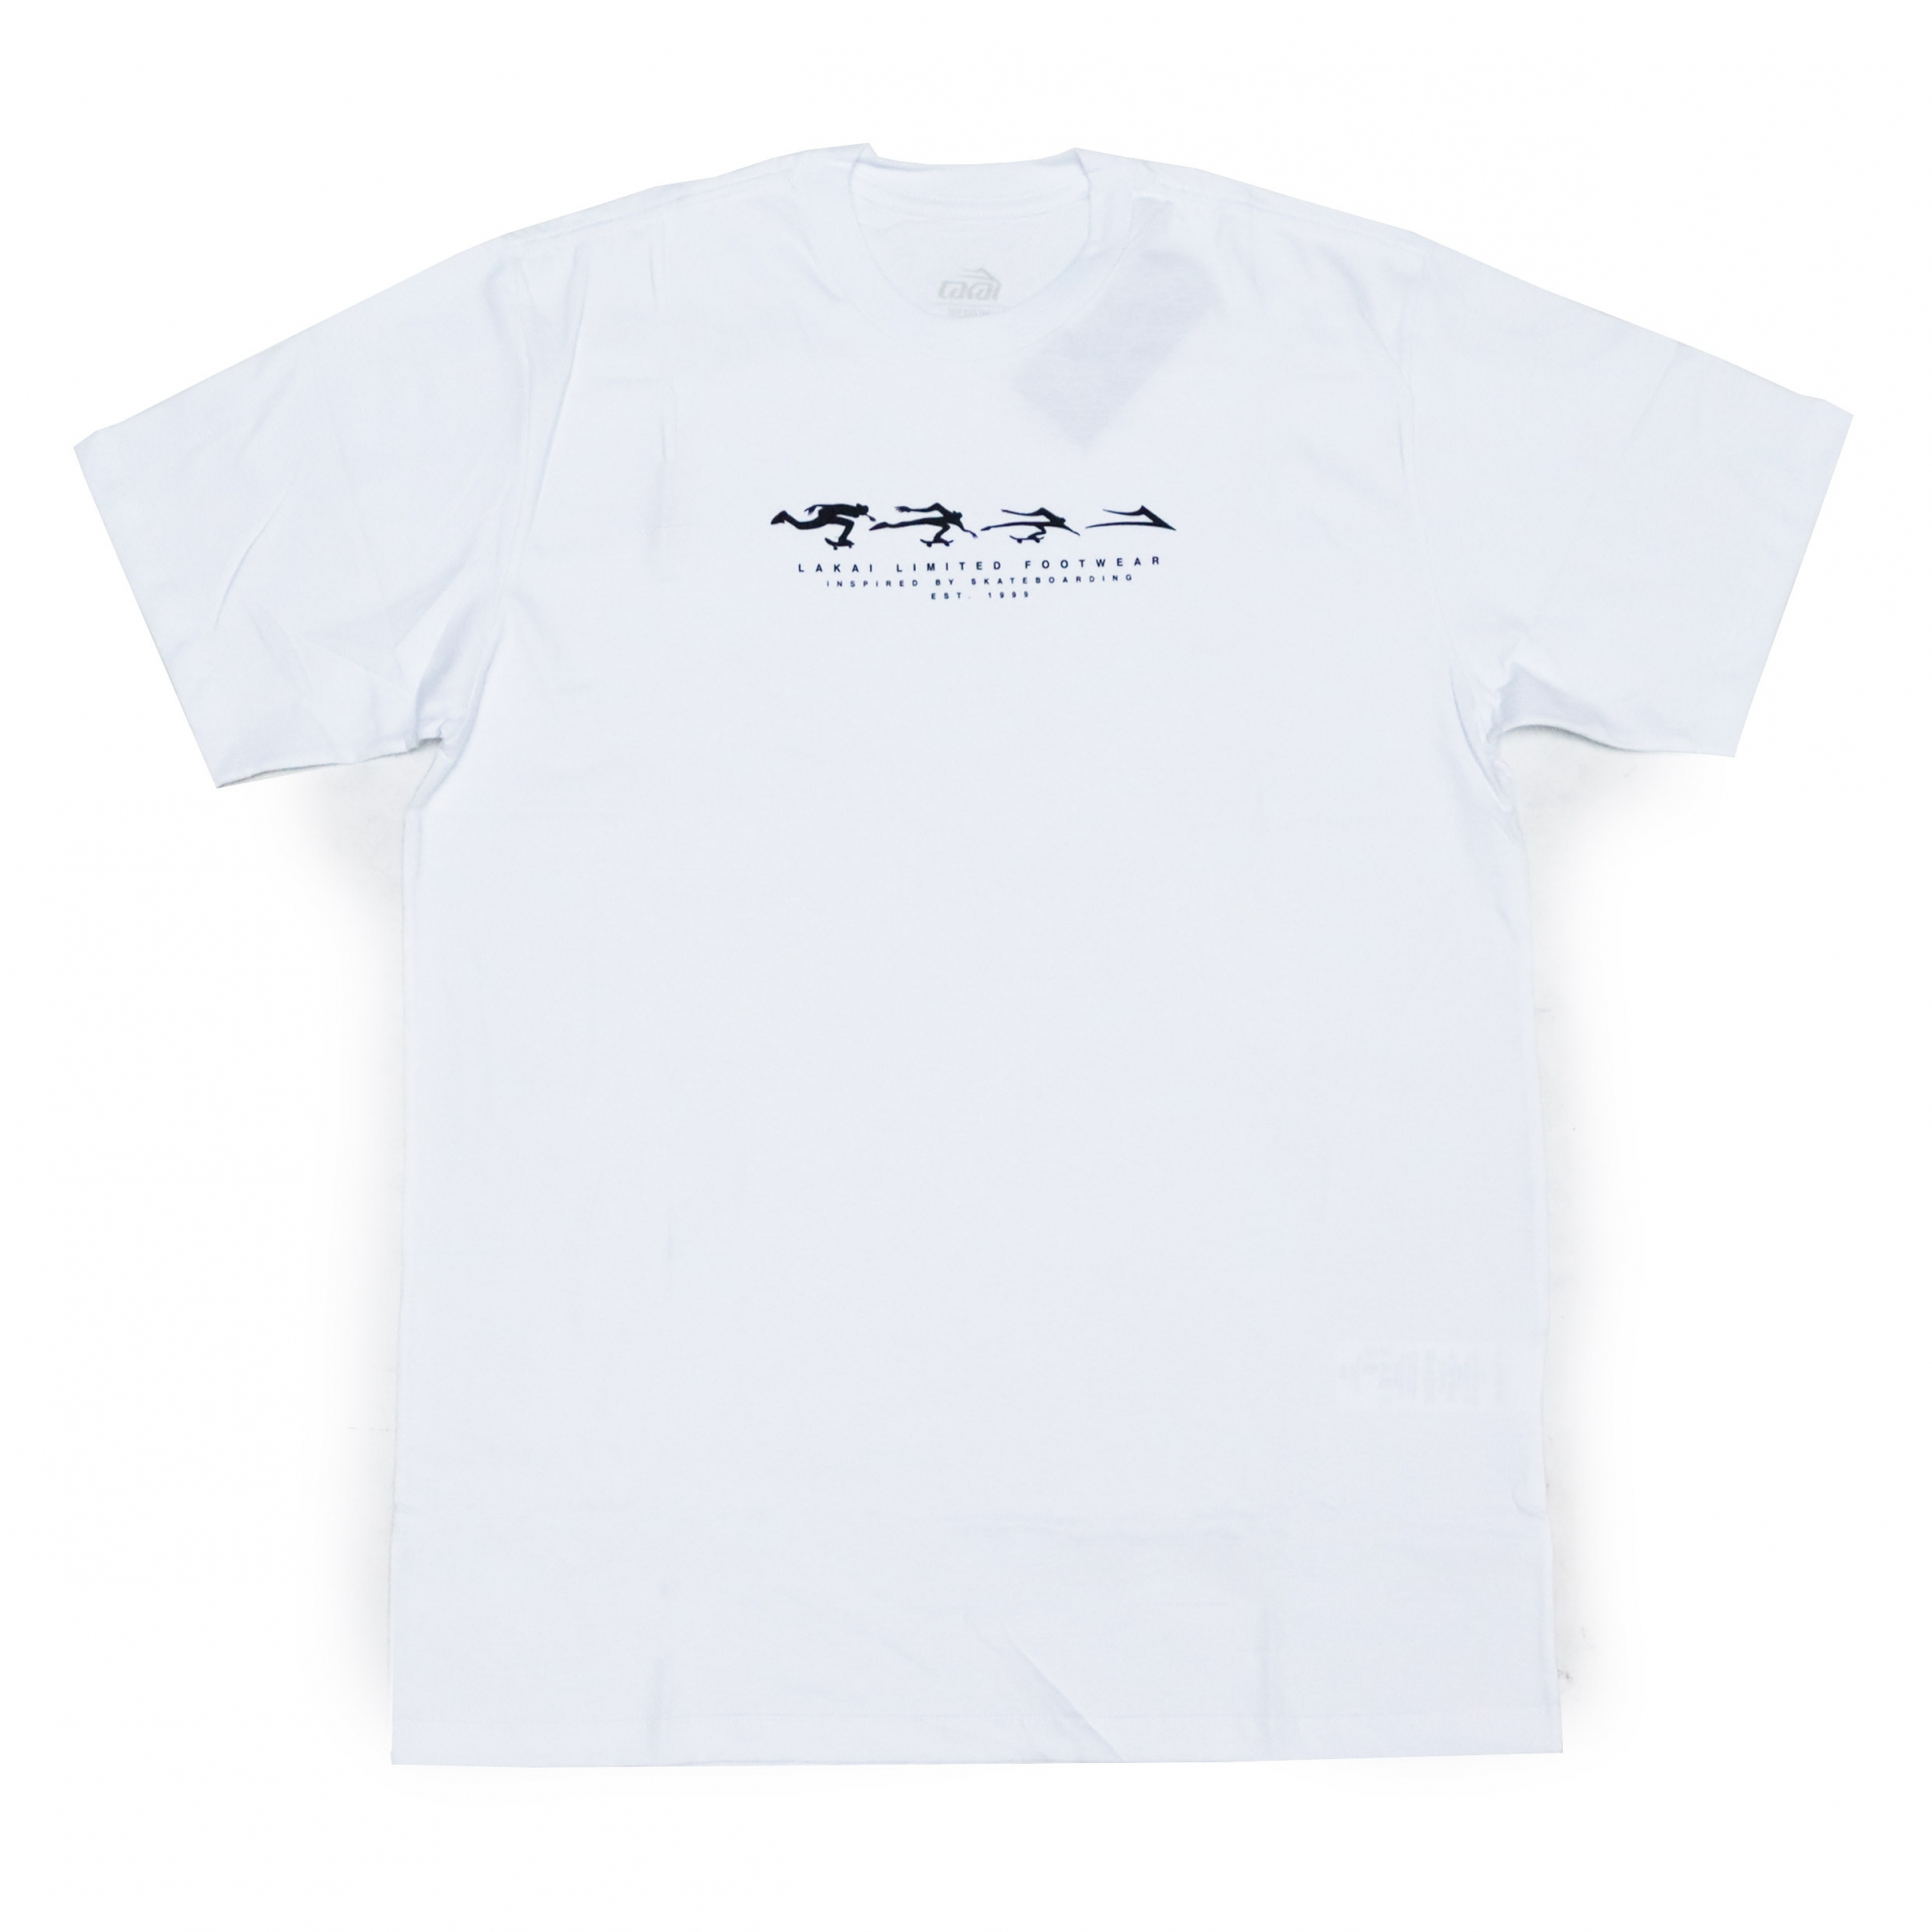 Camiseta Manga Longa Lakai Evolve - Branco